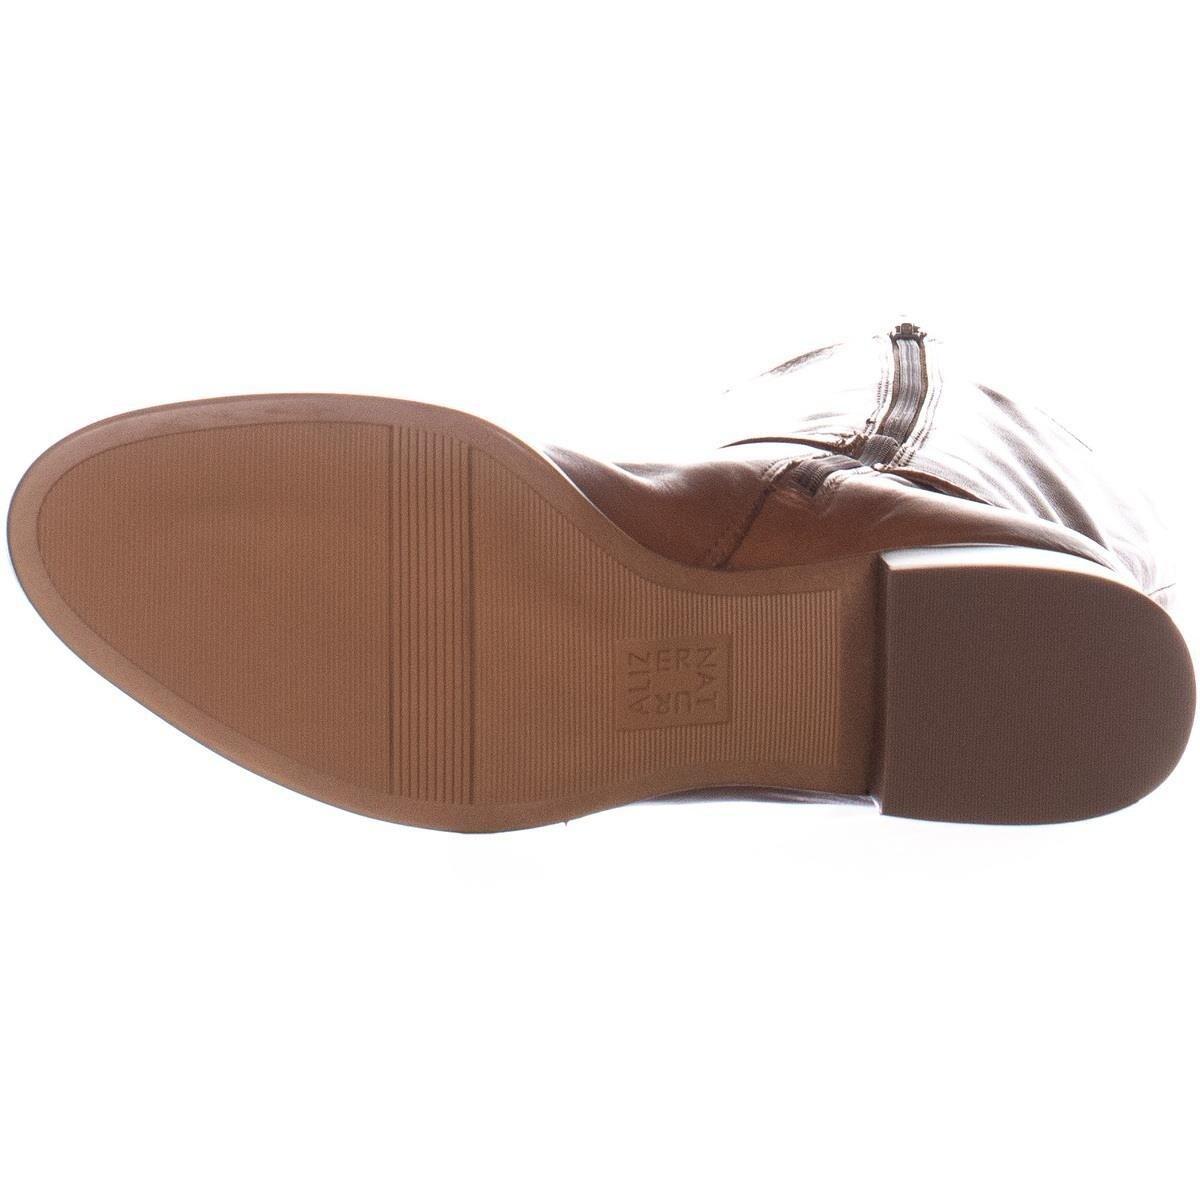 d0e62ce7b89 Shop naturalizer Dane Wide Calf Knee High Boots, Light Maple - 11 us / 41  eu - Free Shipping Today - Overstock - 25696533